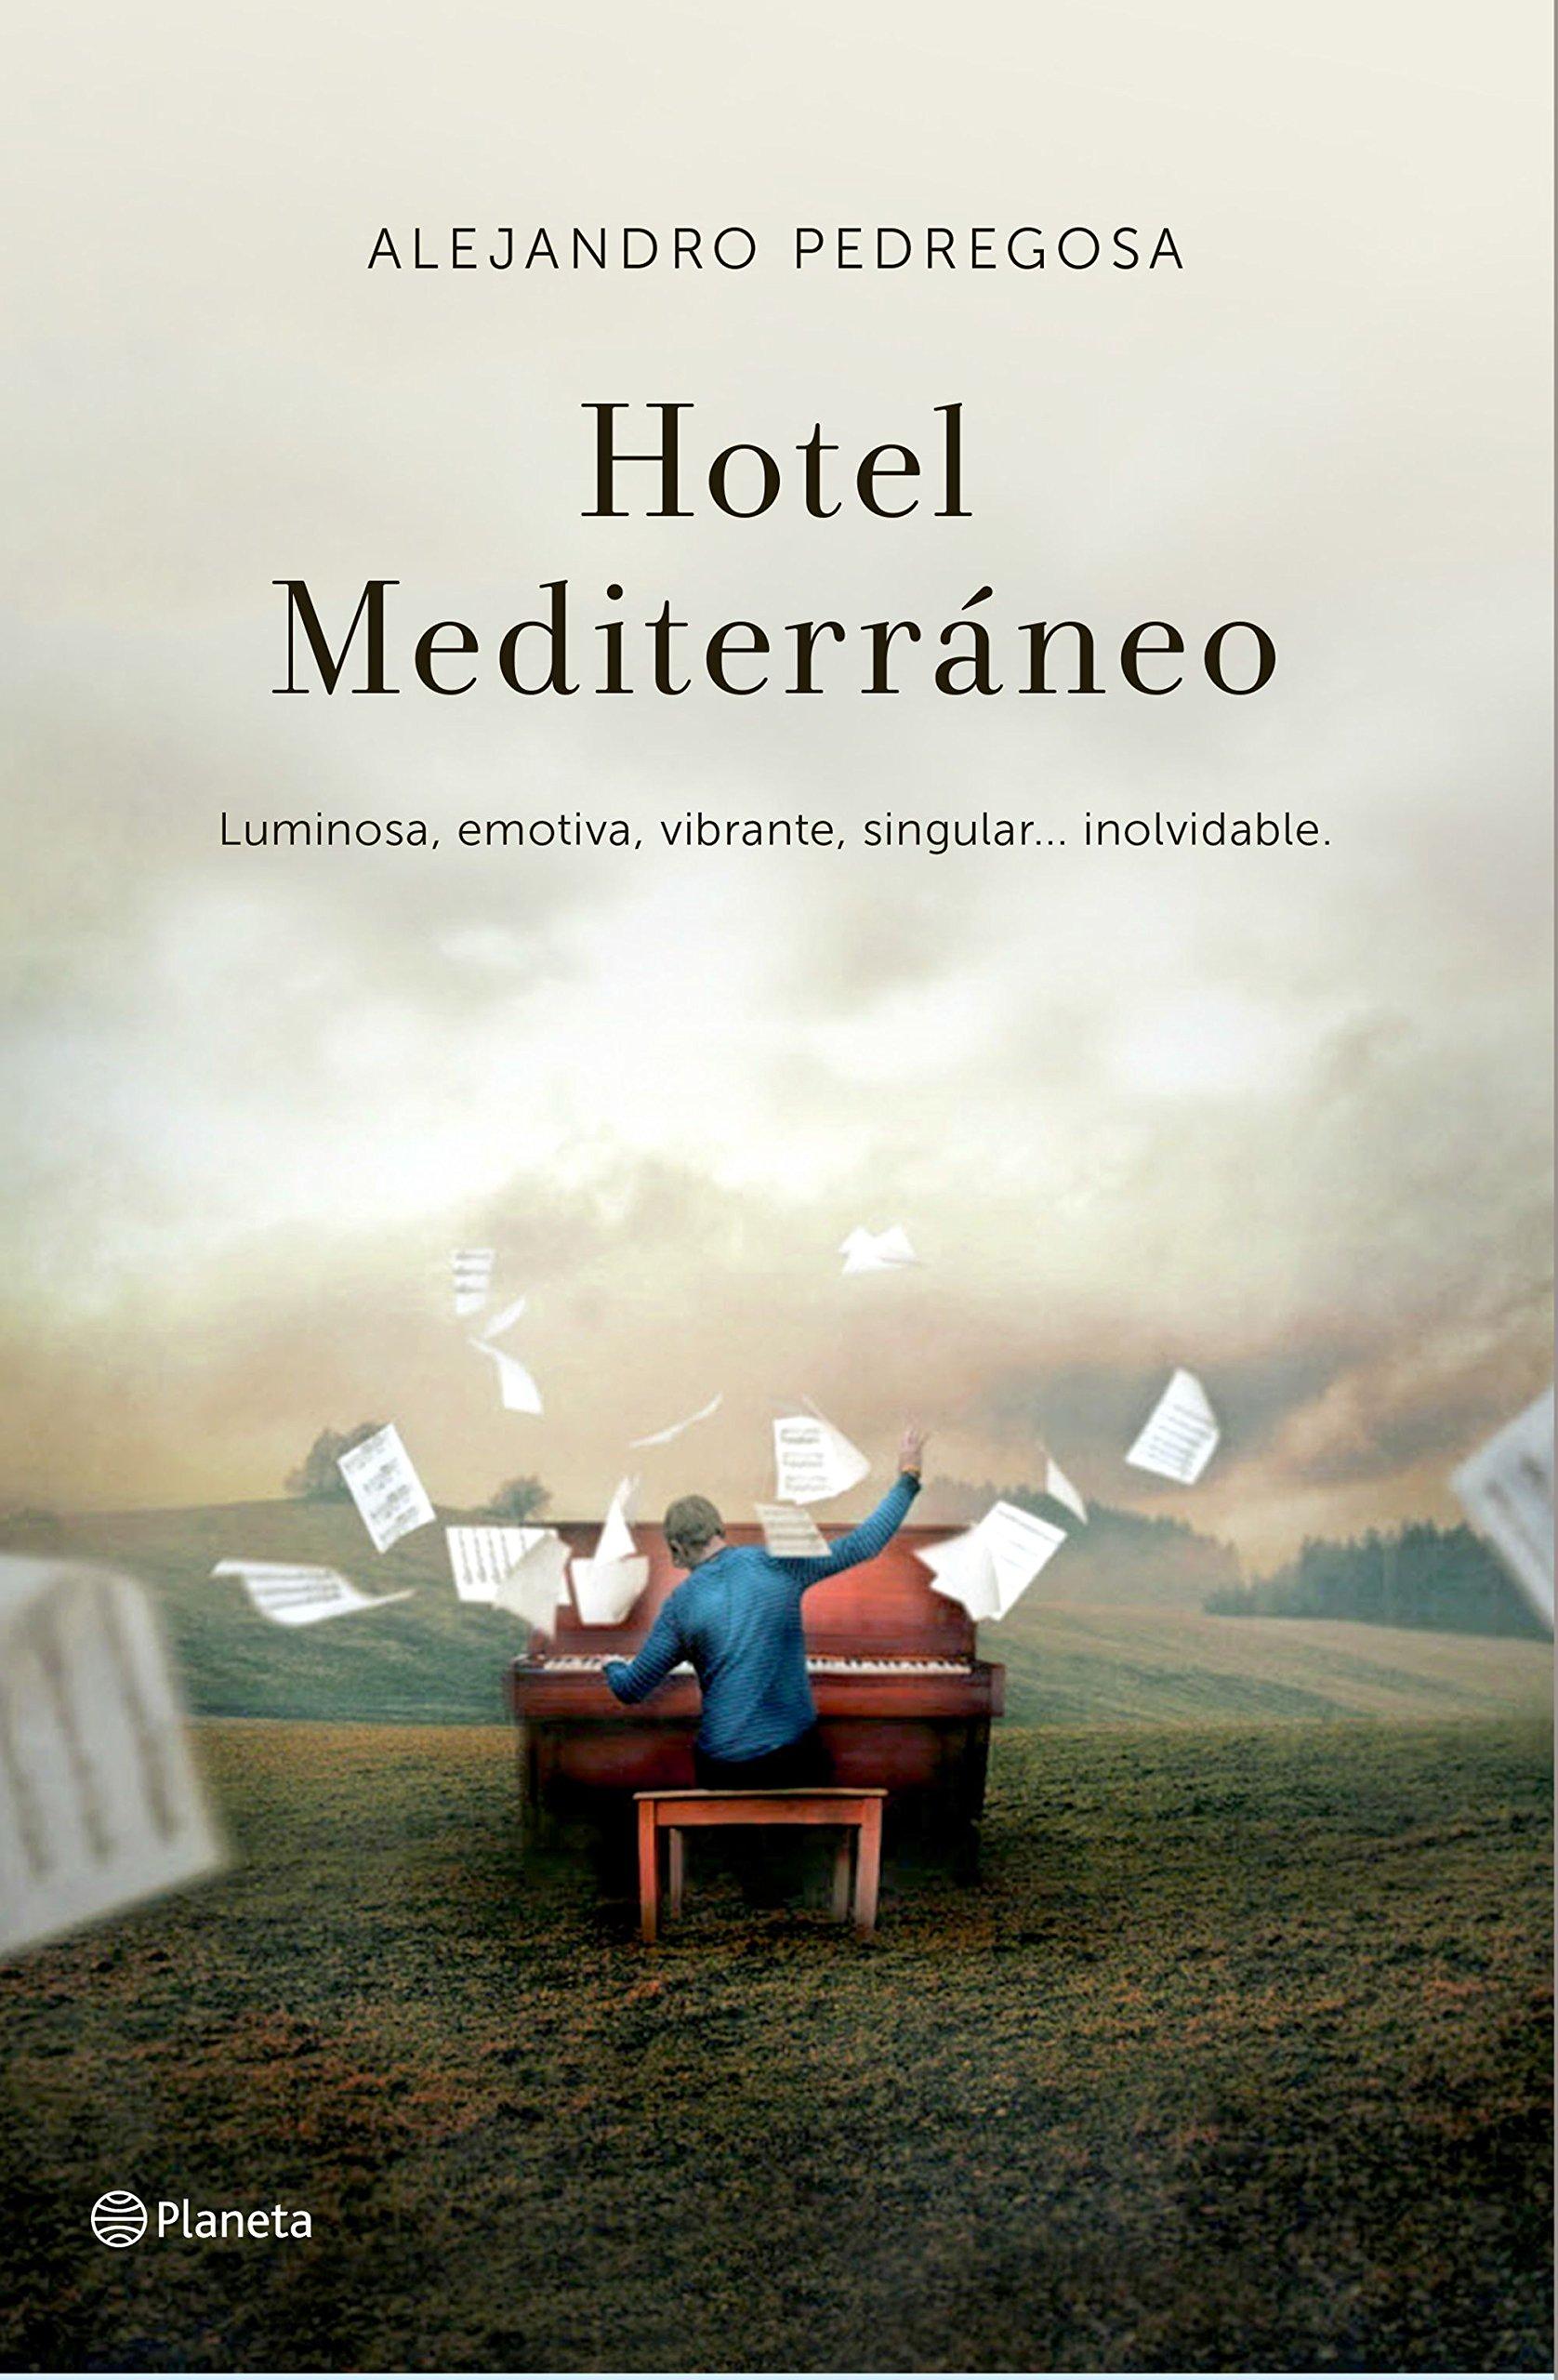 Hotel Mediterráneo (Autores Españoles E Iberoameric.): Amazon.es: Alejandro Pedregosa: Libros